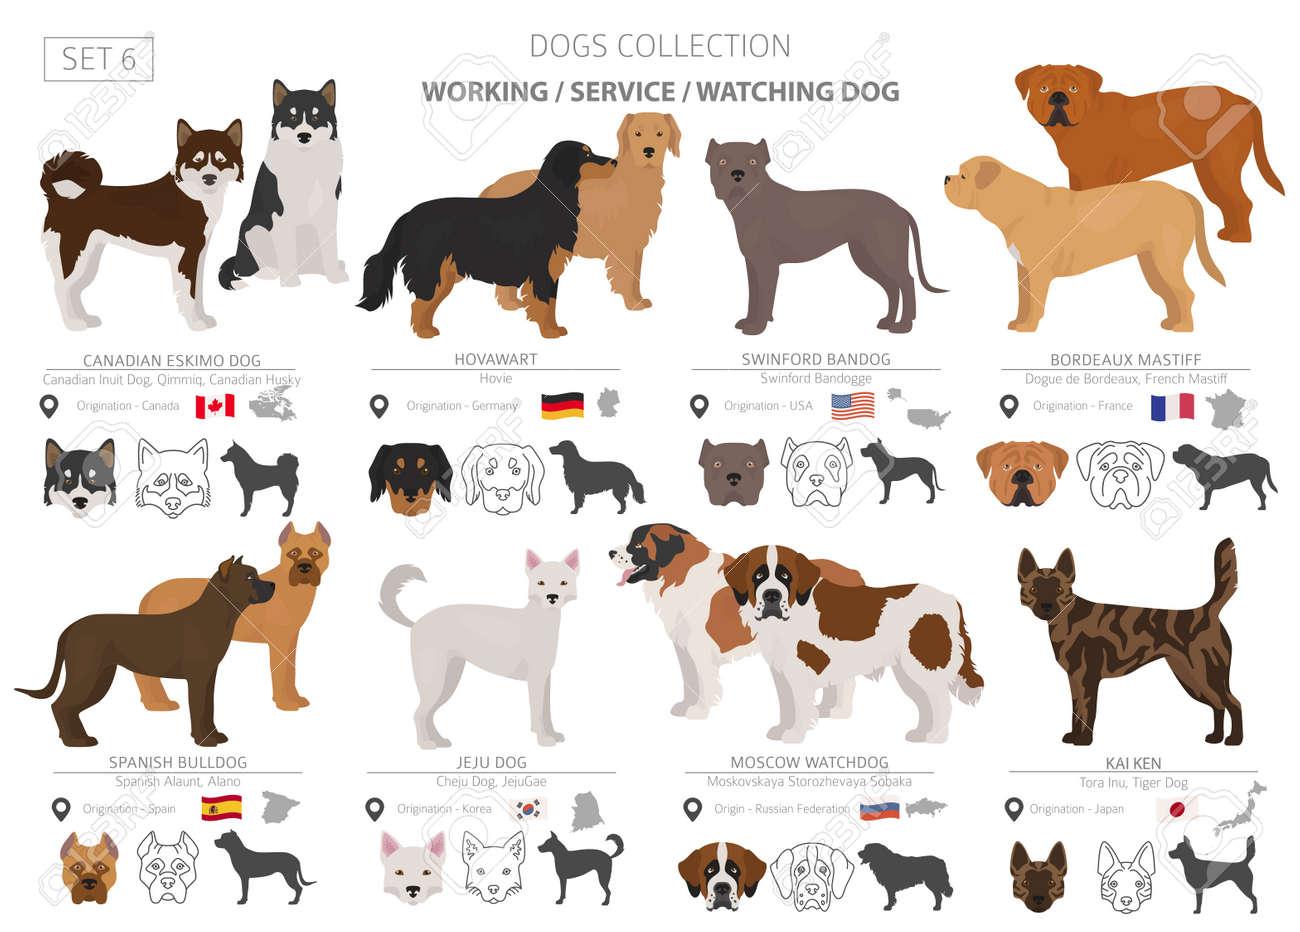 BANDOG BREEDERS CANADA - American Bandogge Mastiff Puppies